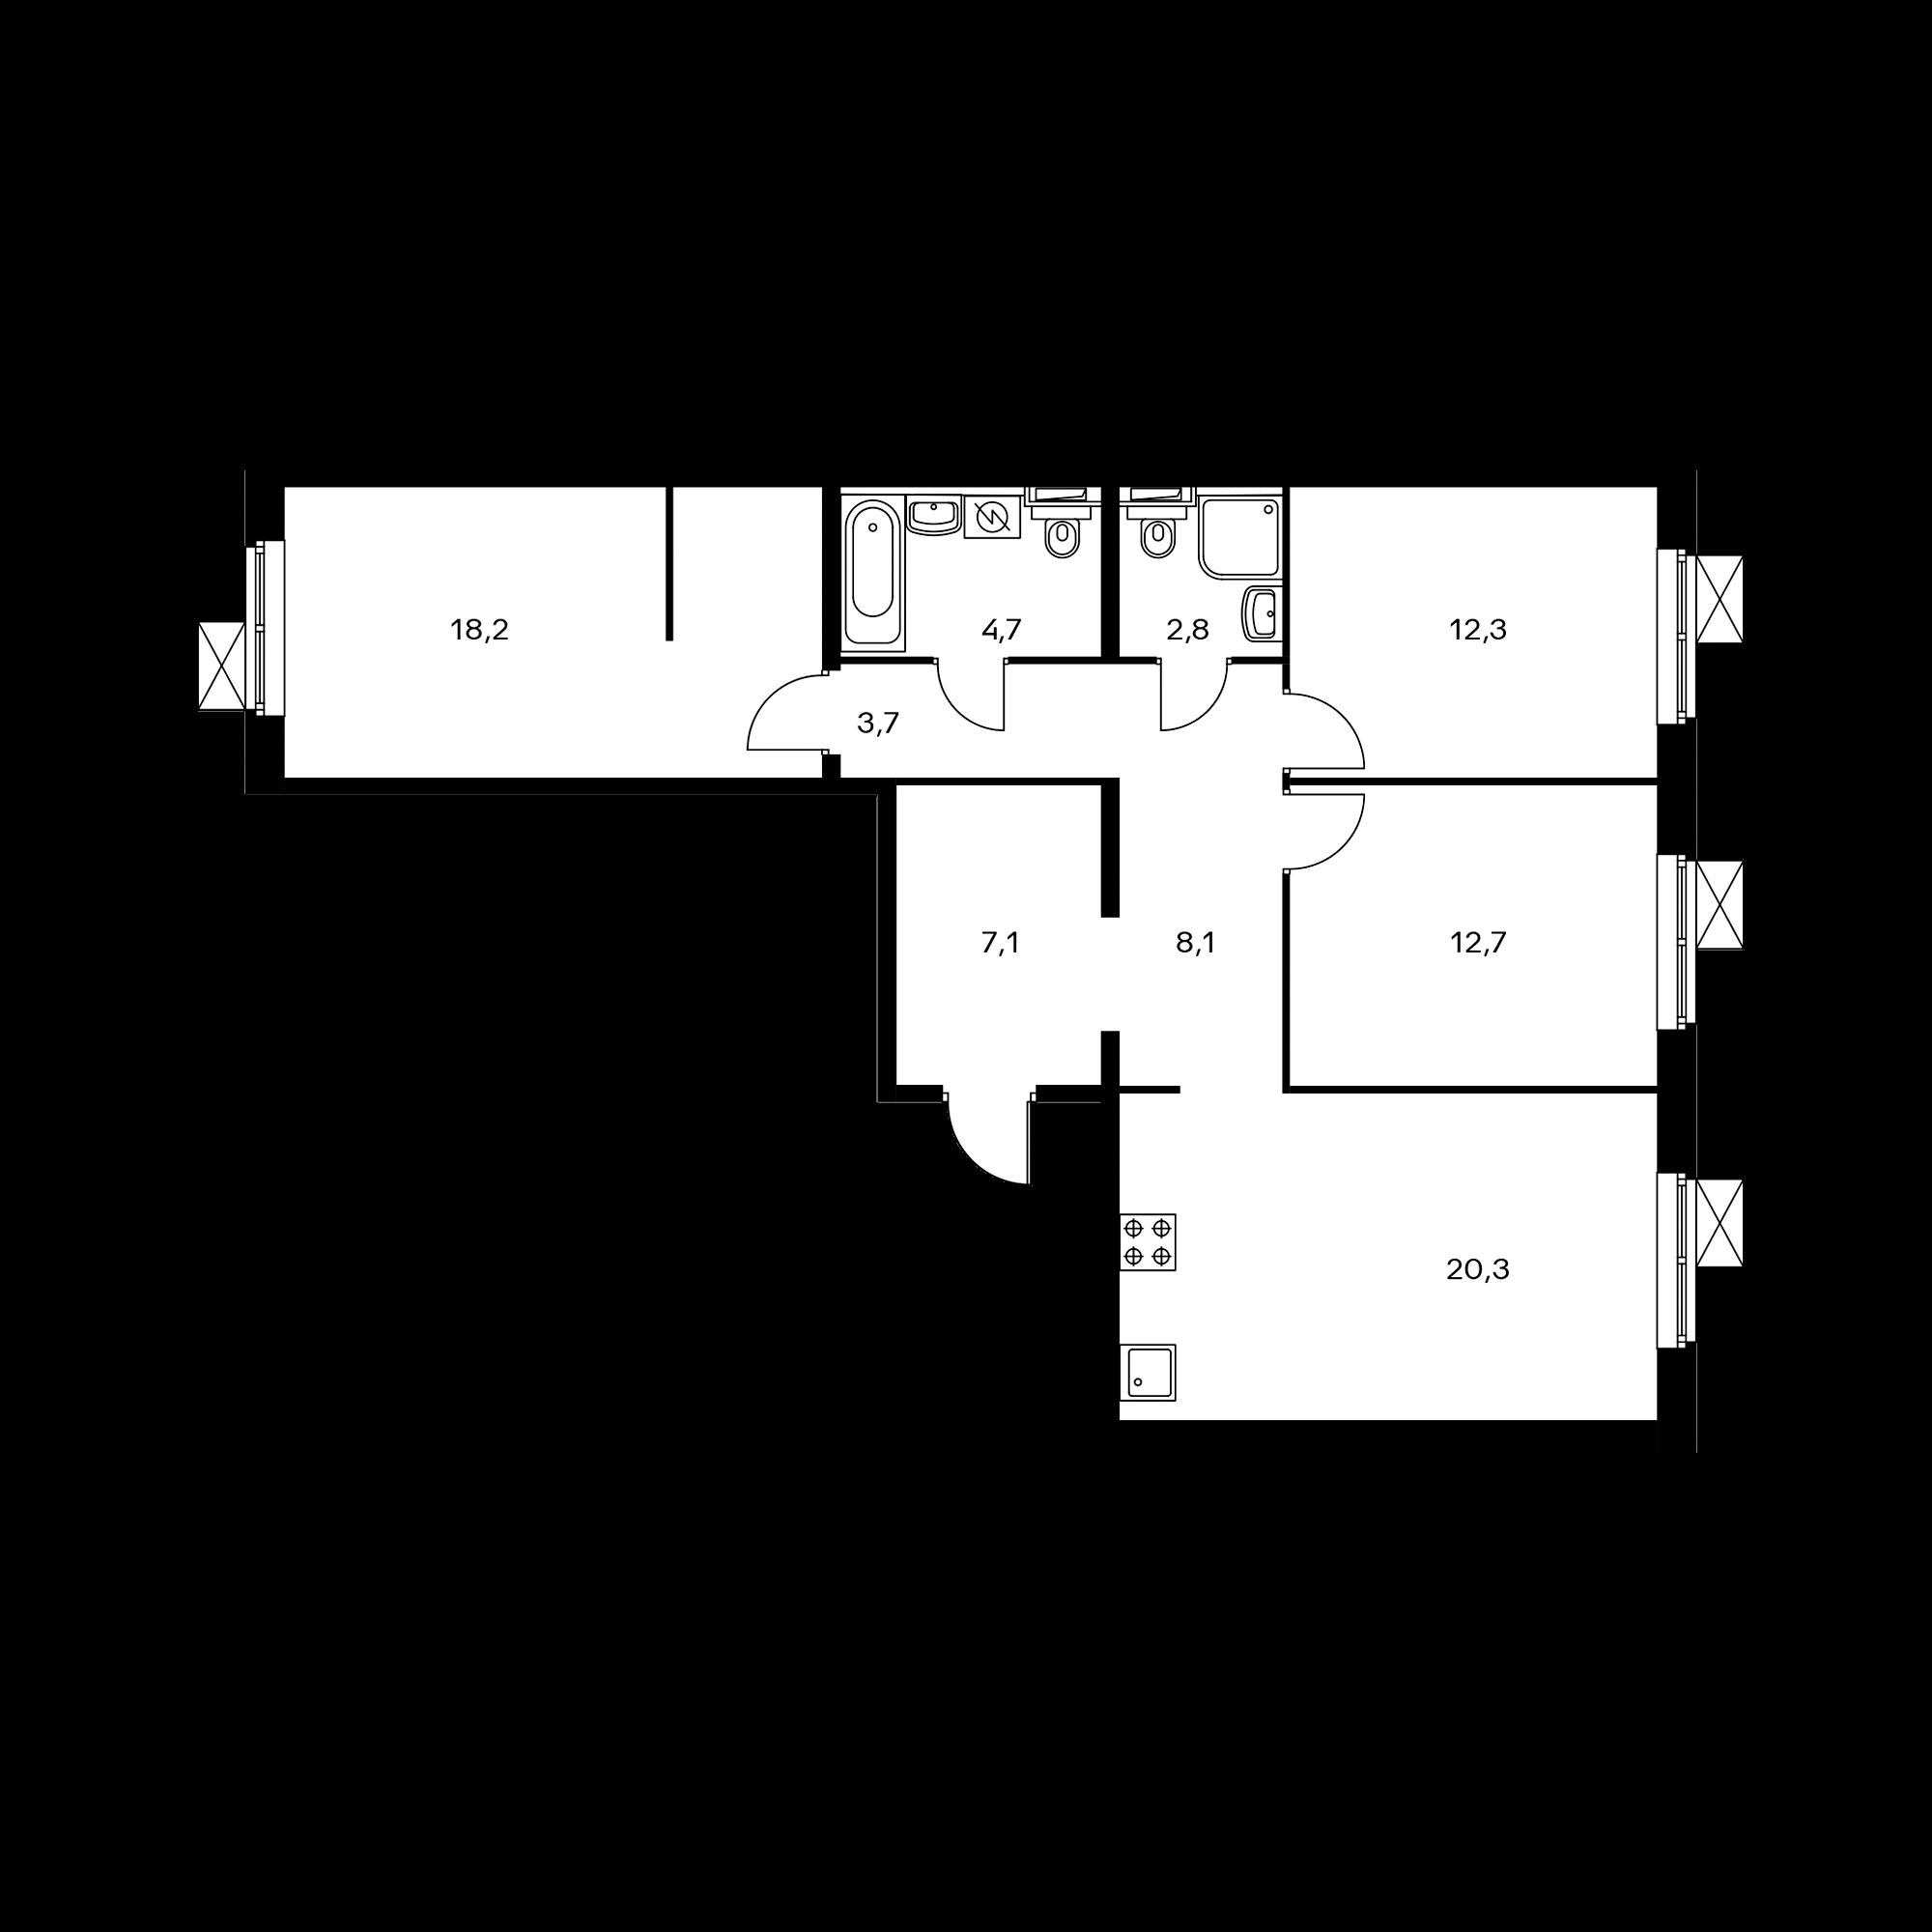 3EL3_10.2-1